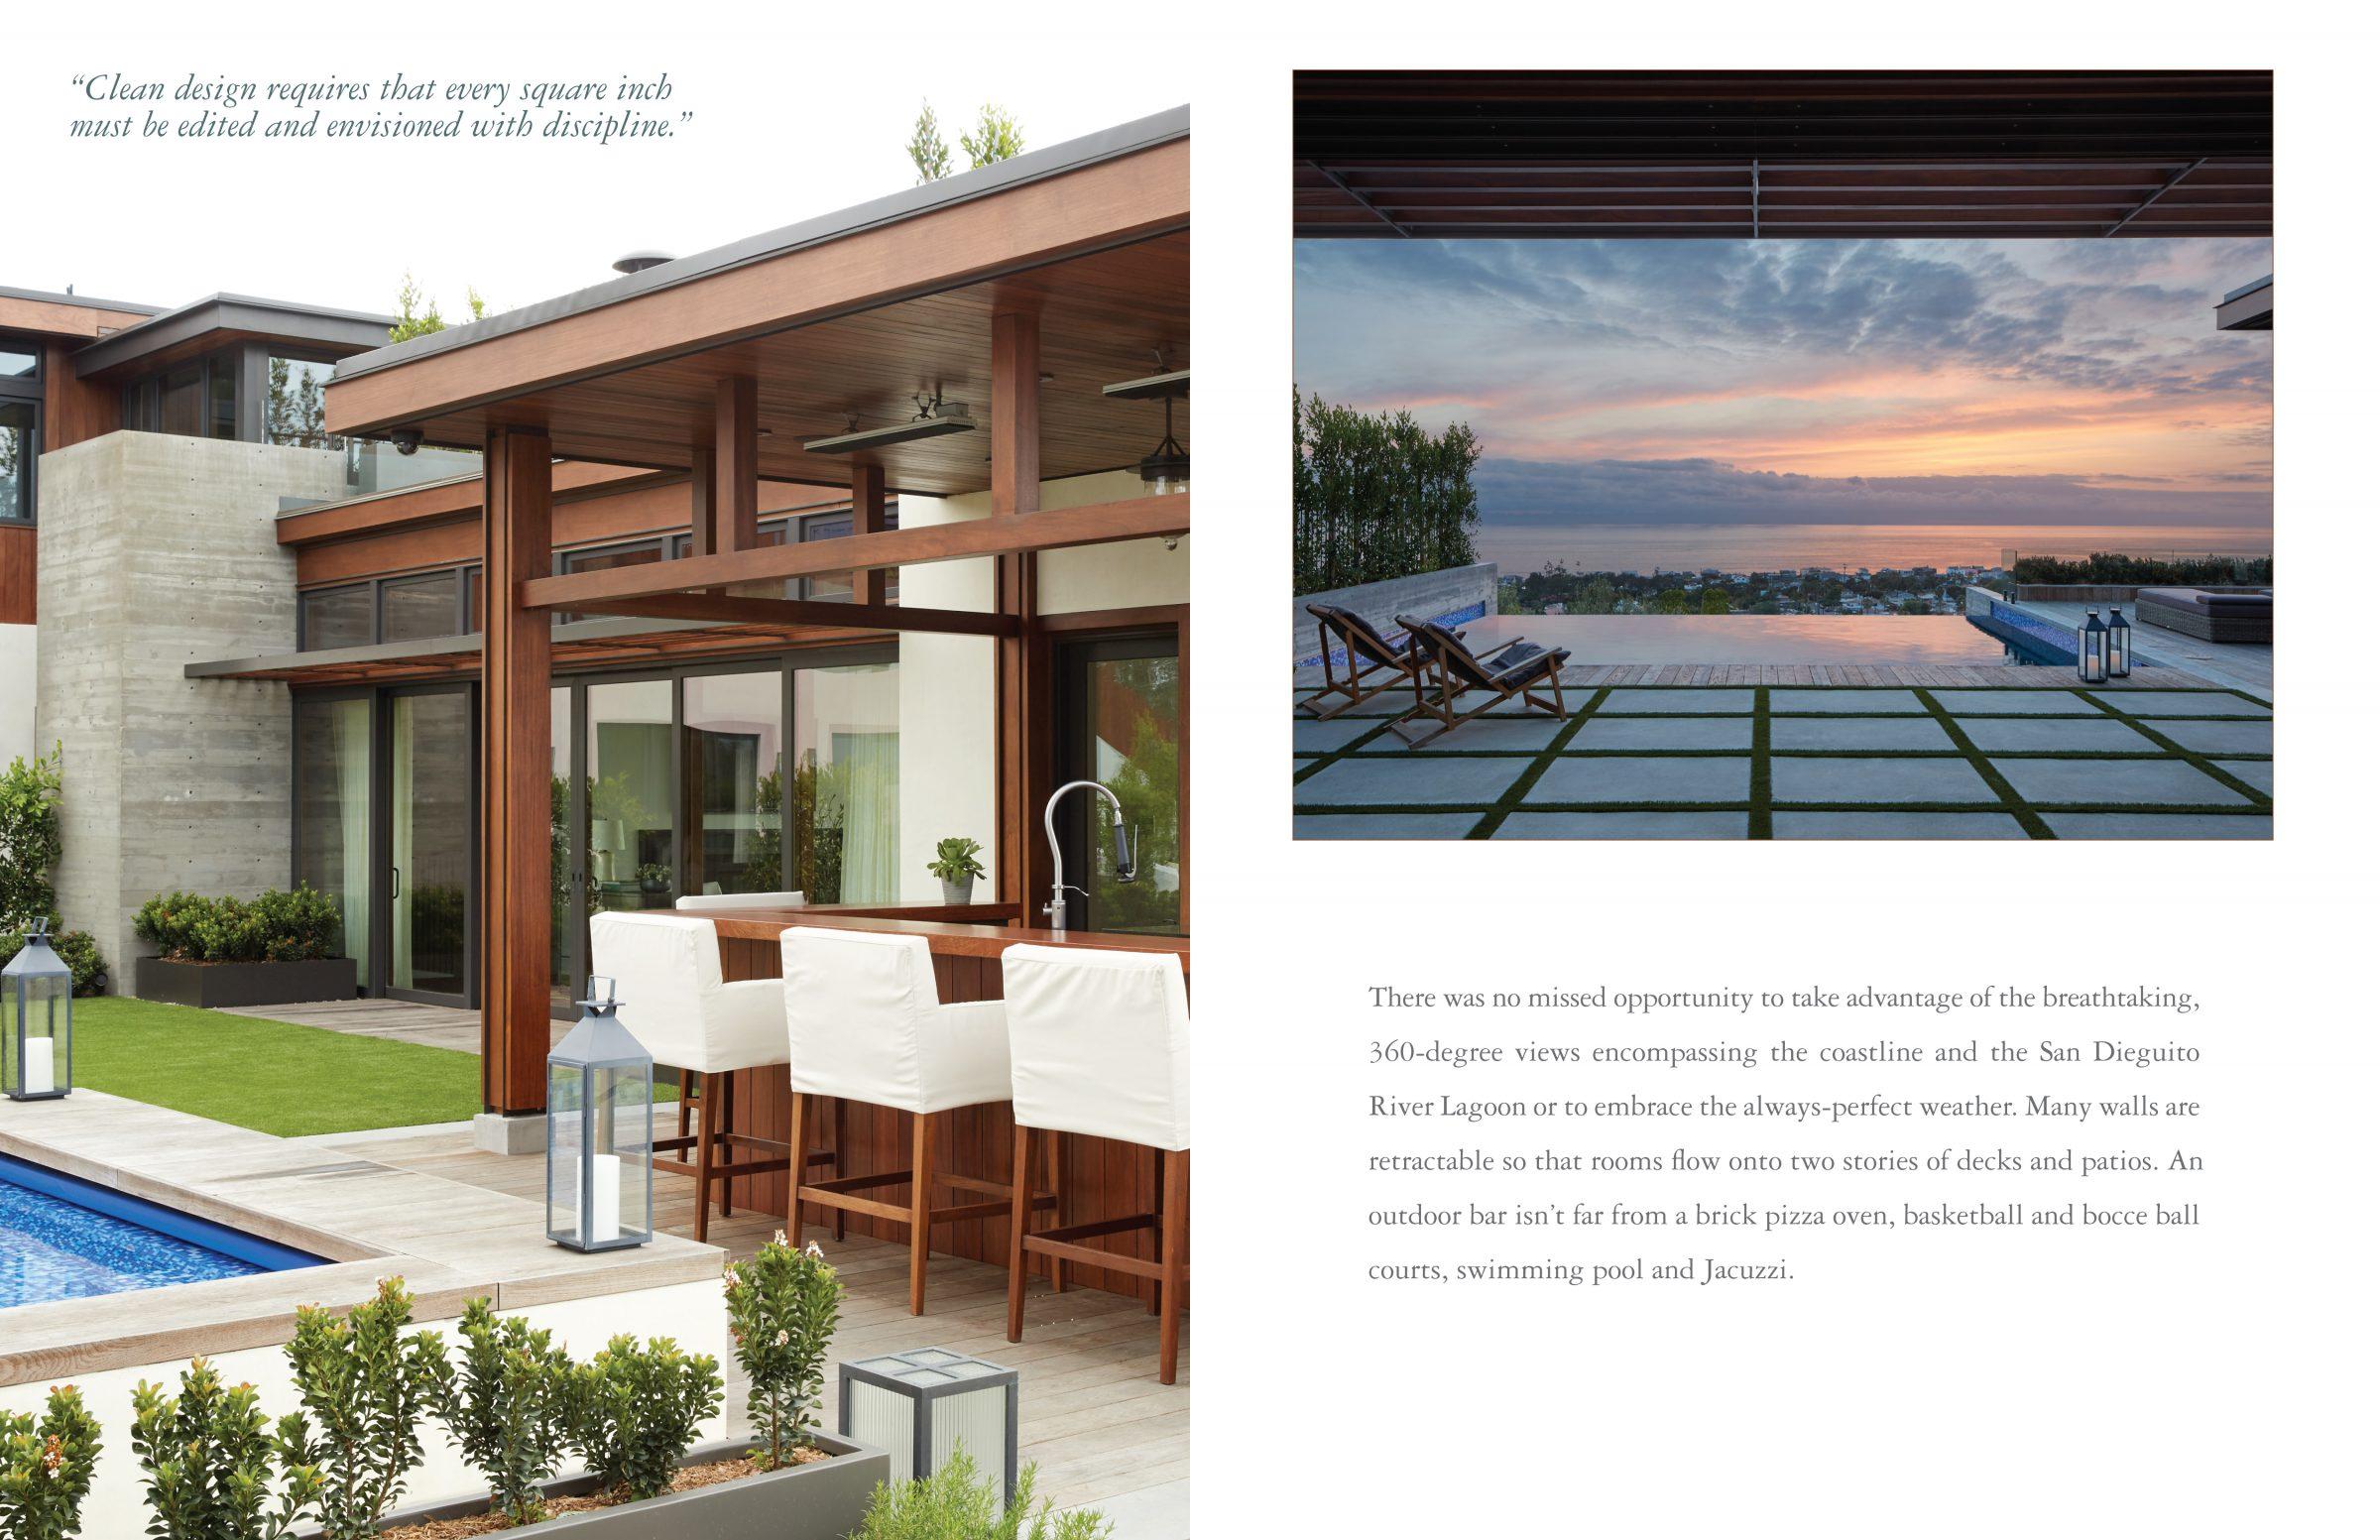 Beach Pretty Style: The Seaside House by Mark J. Williams..Take a TourA gorgeous view of the   San Dieguito River Lagoon